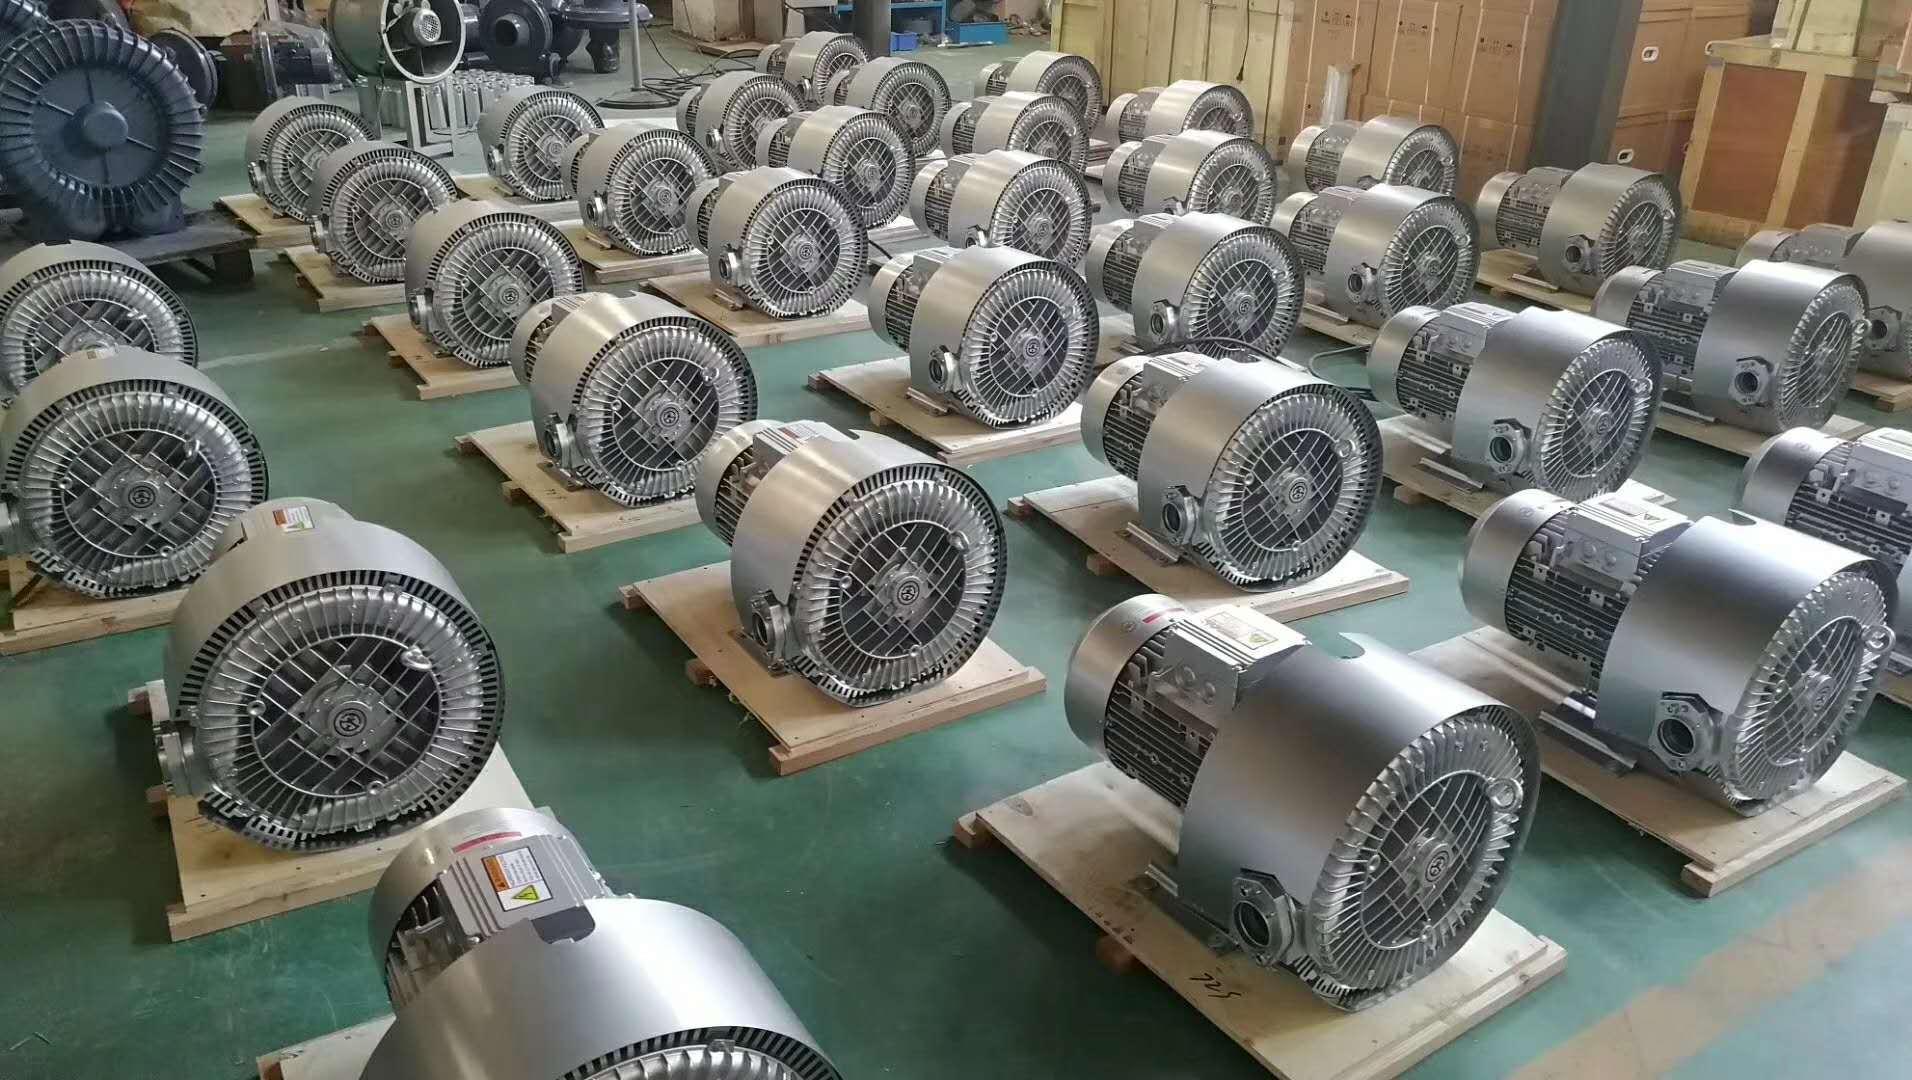 20kw50HZ漩涡风机 型号LYX-94S-2立式 60HZ 23kw高压漩涡风机示例图14